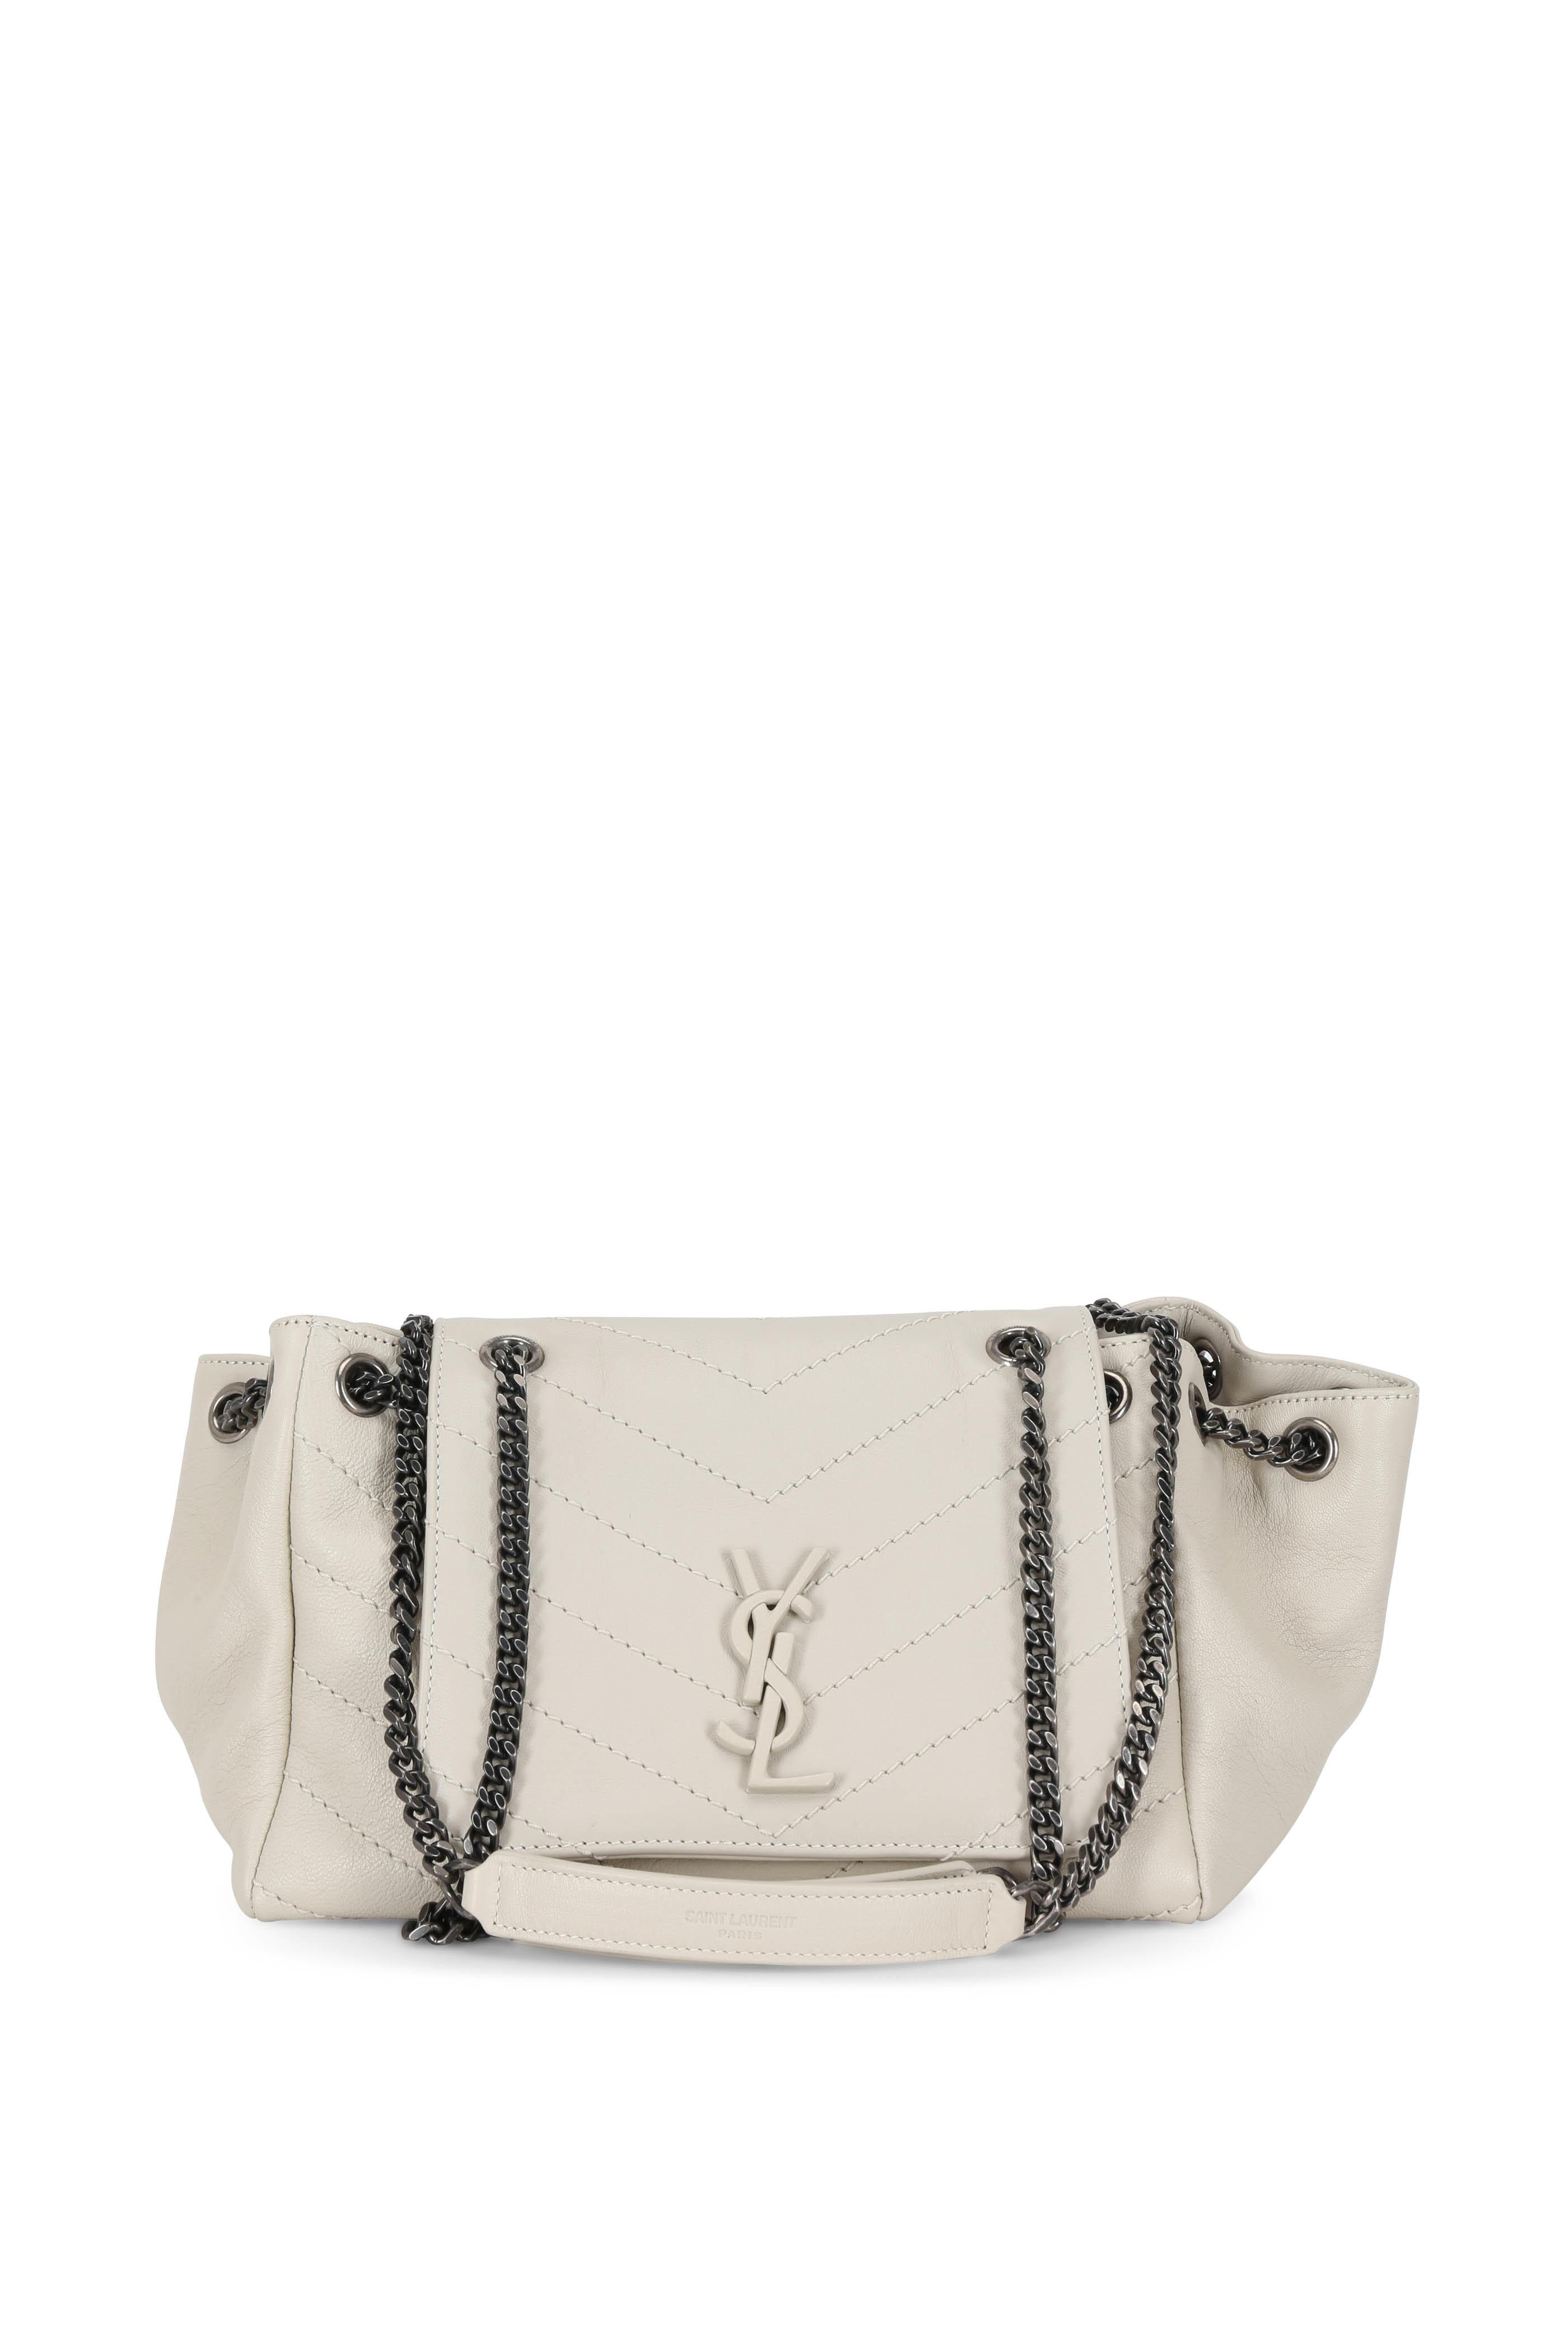 dd6e441f83 Saint Laurent - Nolita Monogram White Quilted Small Bag | Mitchell ...